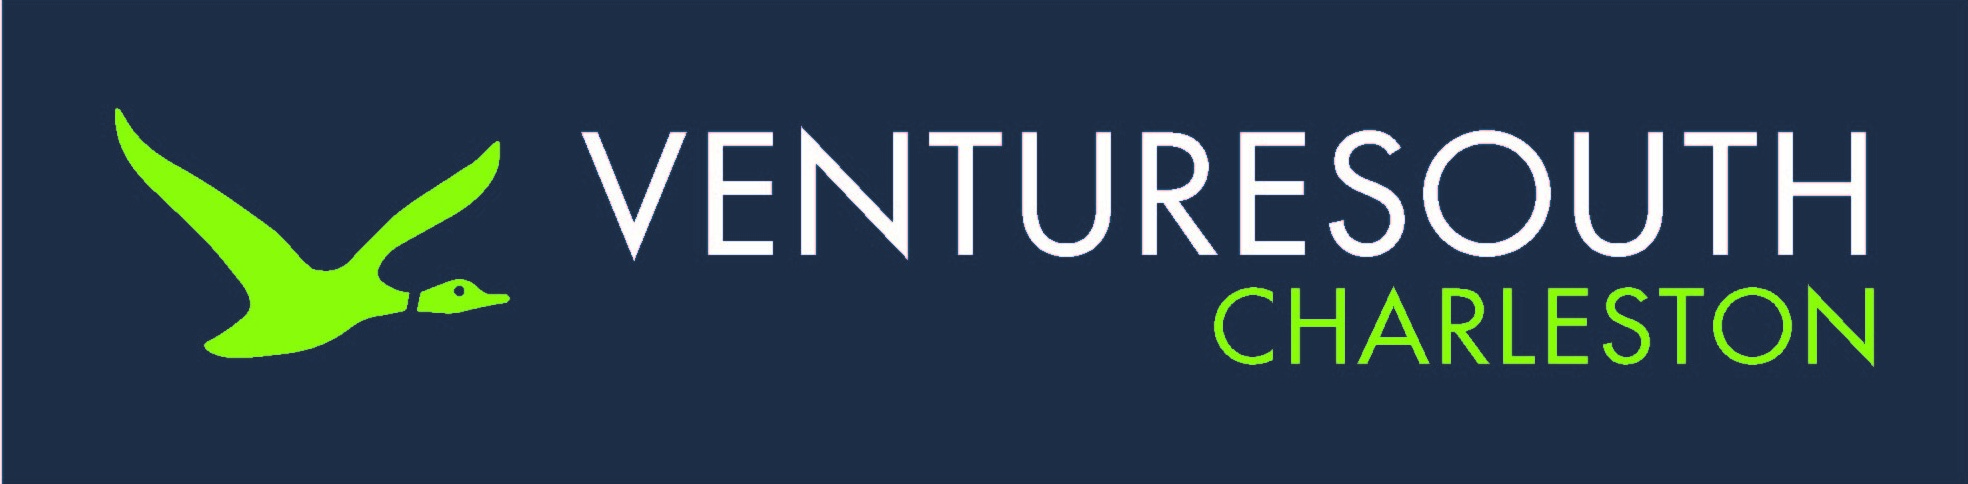 VentureSouth Charleston logo